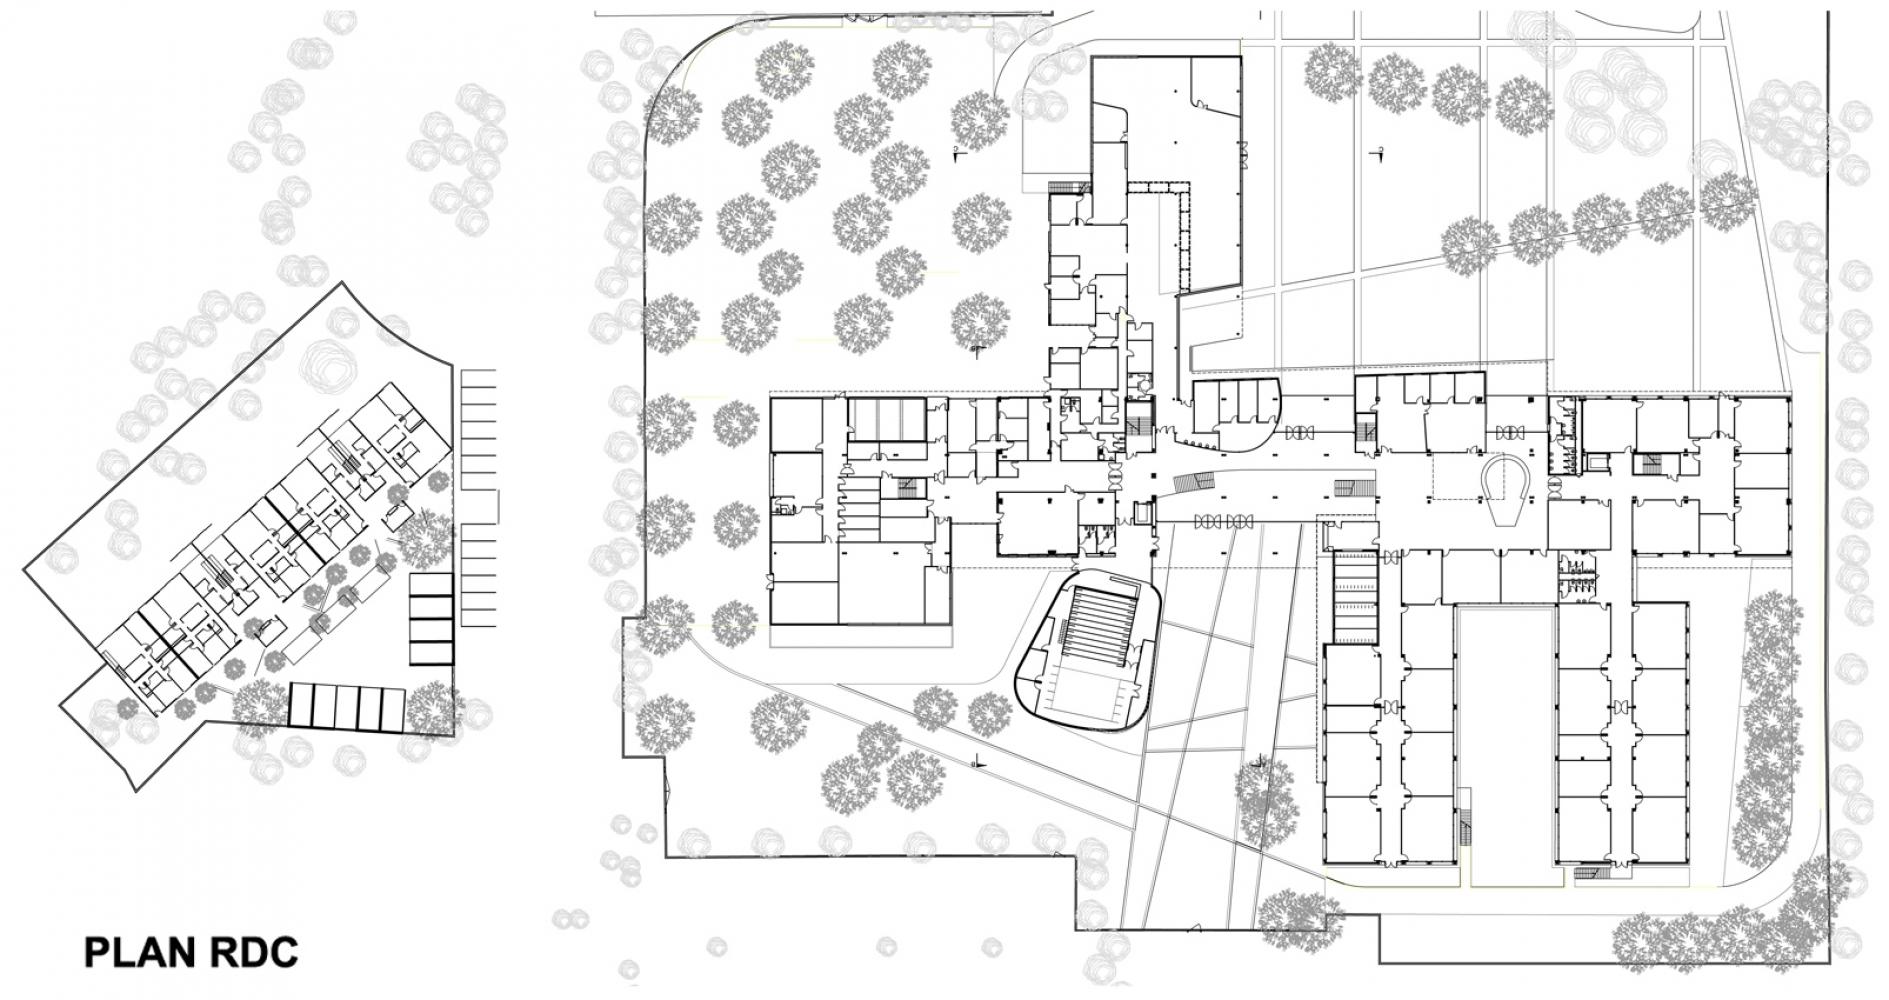 xevr---04 Pascale SEURIN Architecte - Pascale SEURIN Architecte